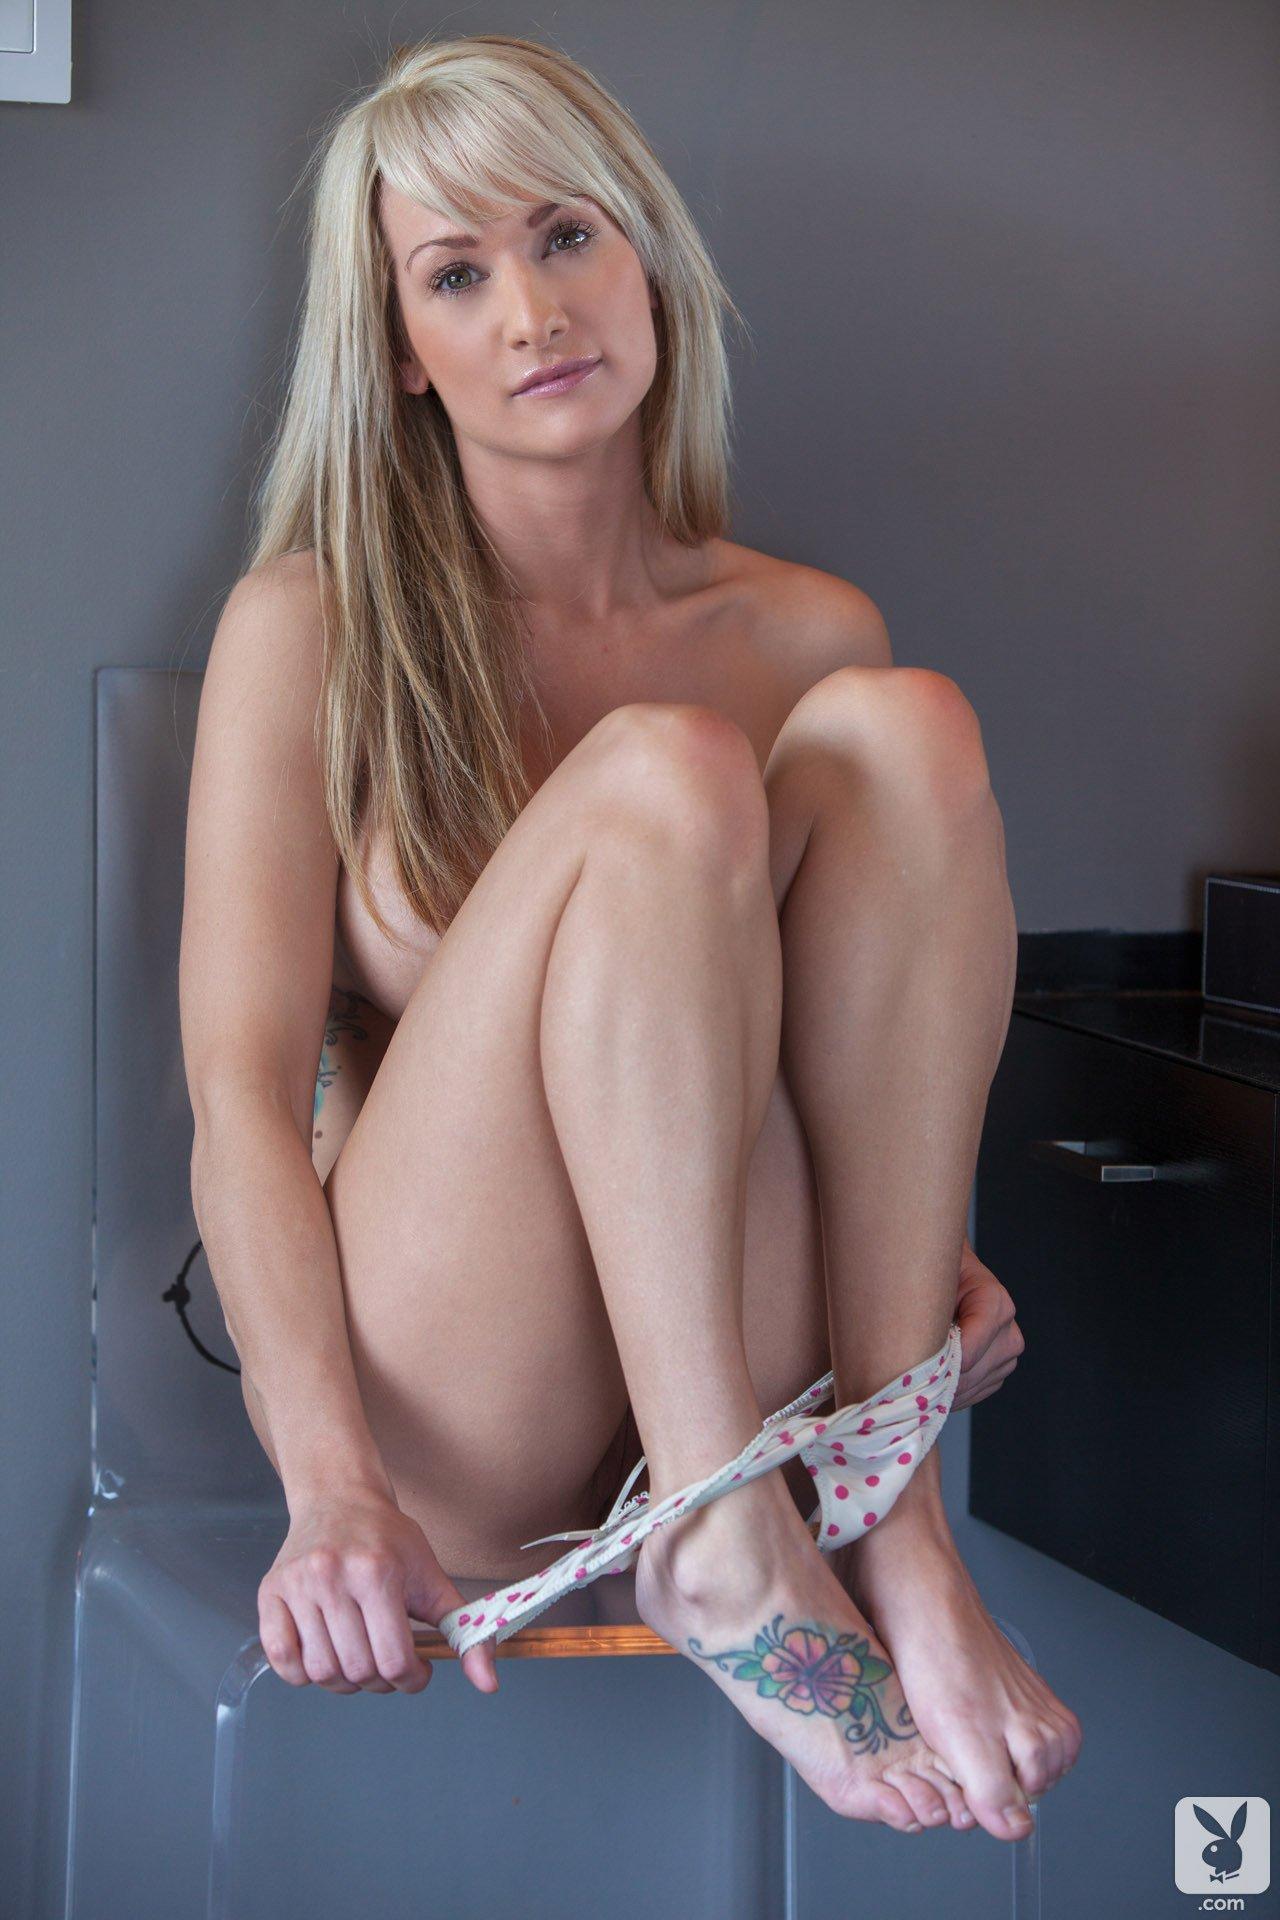 jessie-ann-blonde-boobs-bathtube-naked-playboy-08